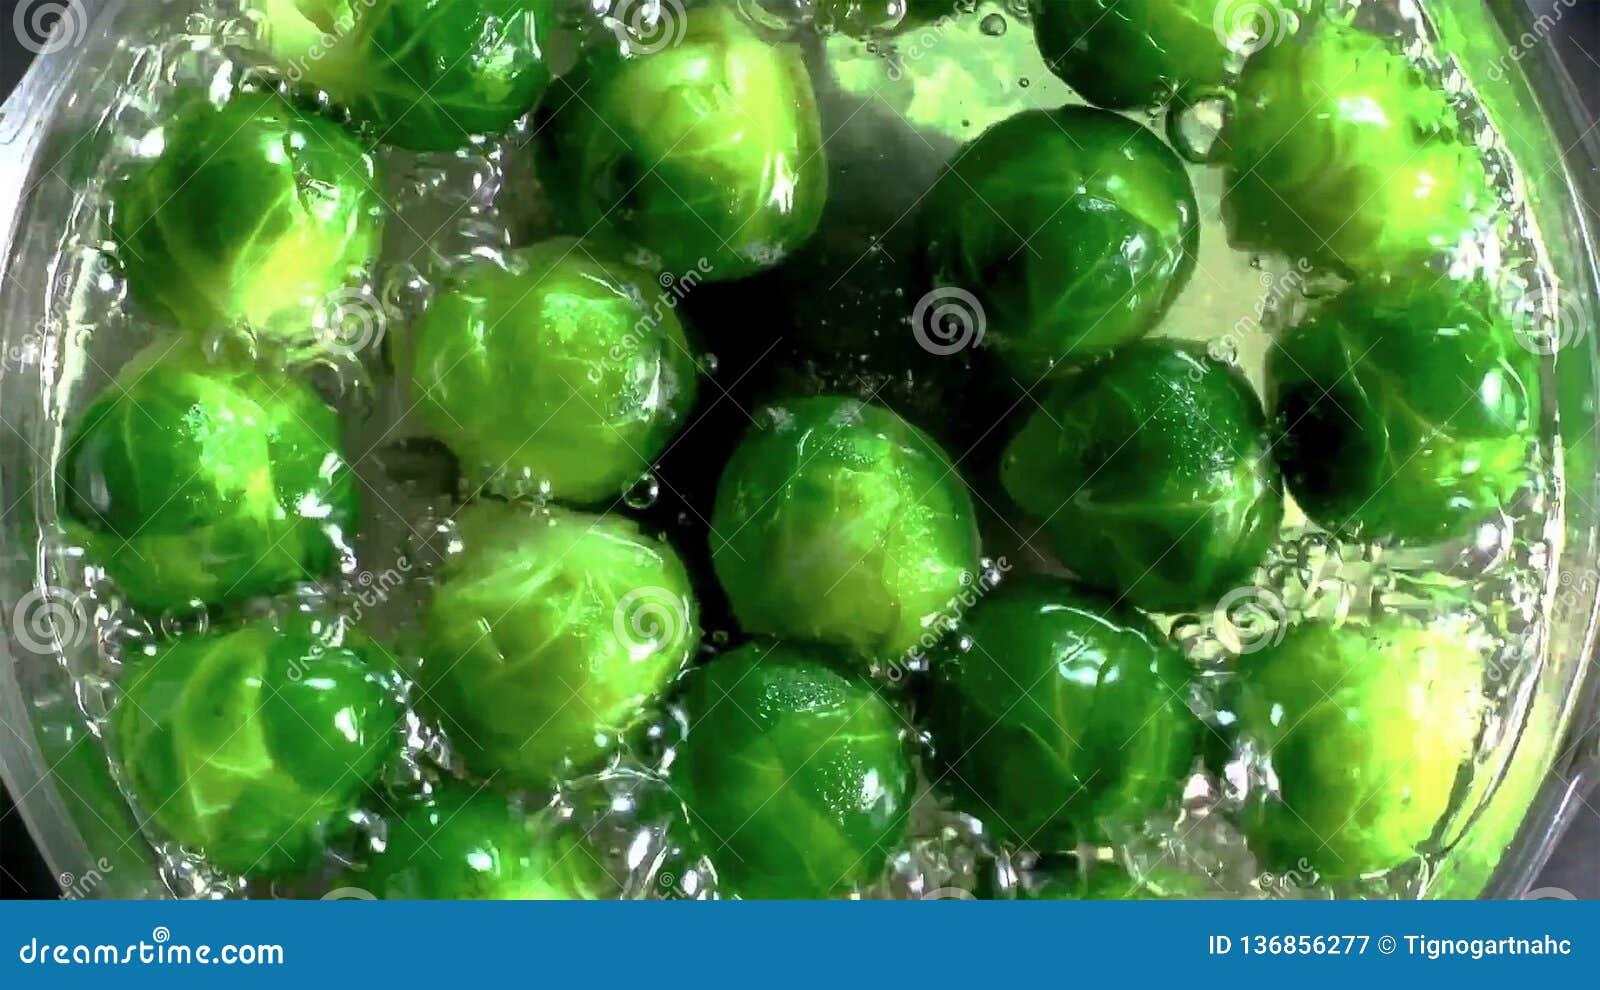 Gekookte spruitjes met water op metaalpan